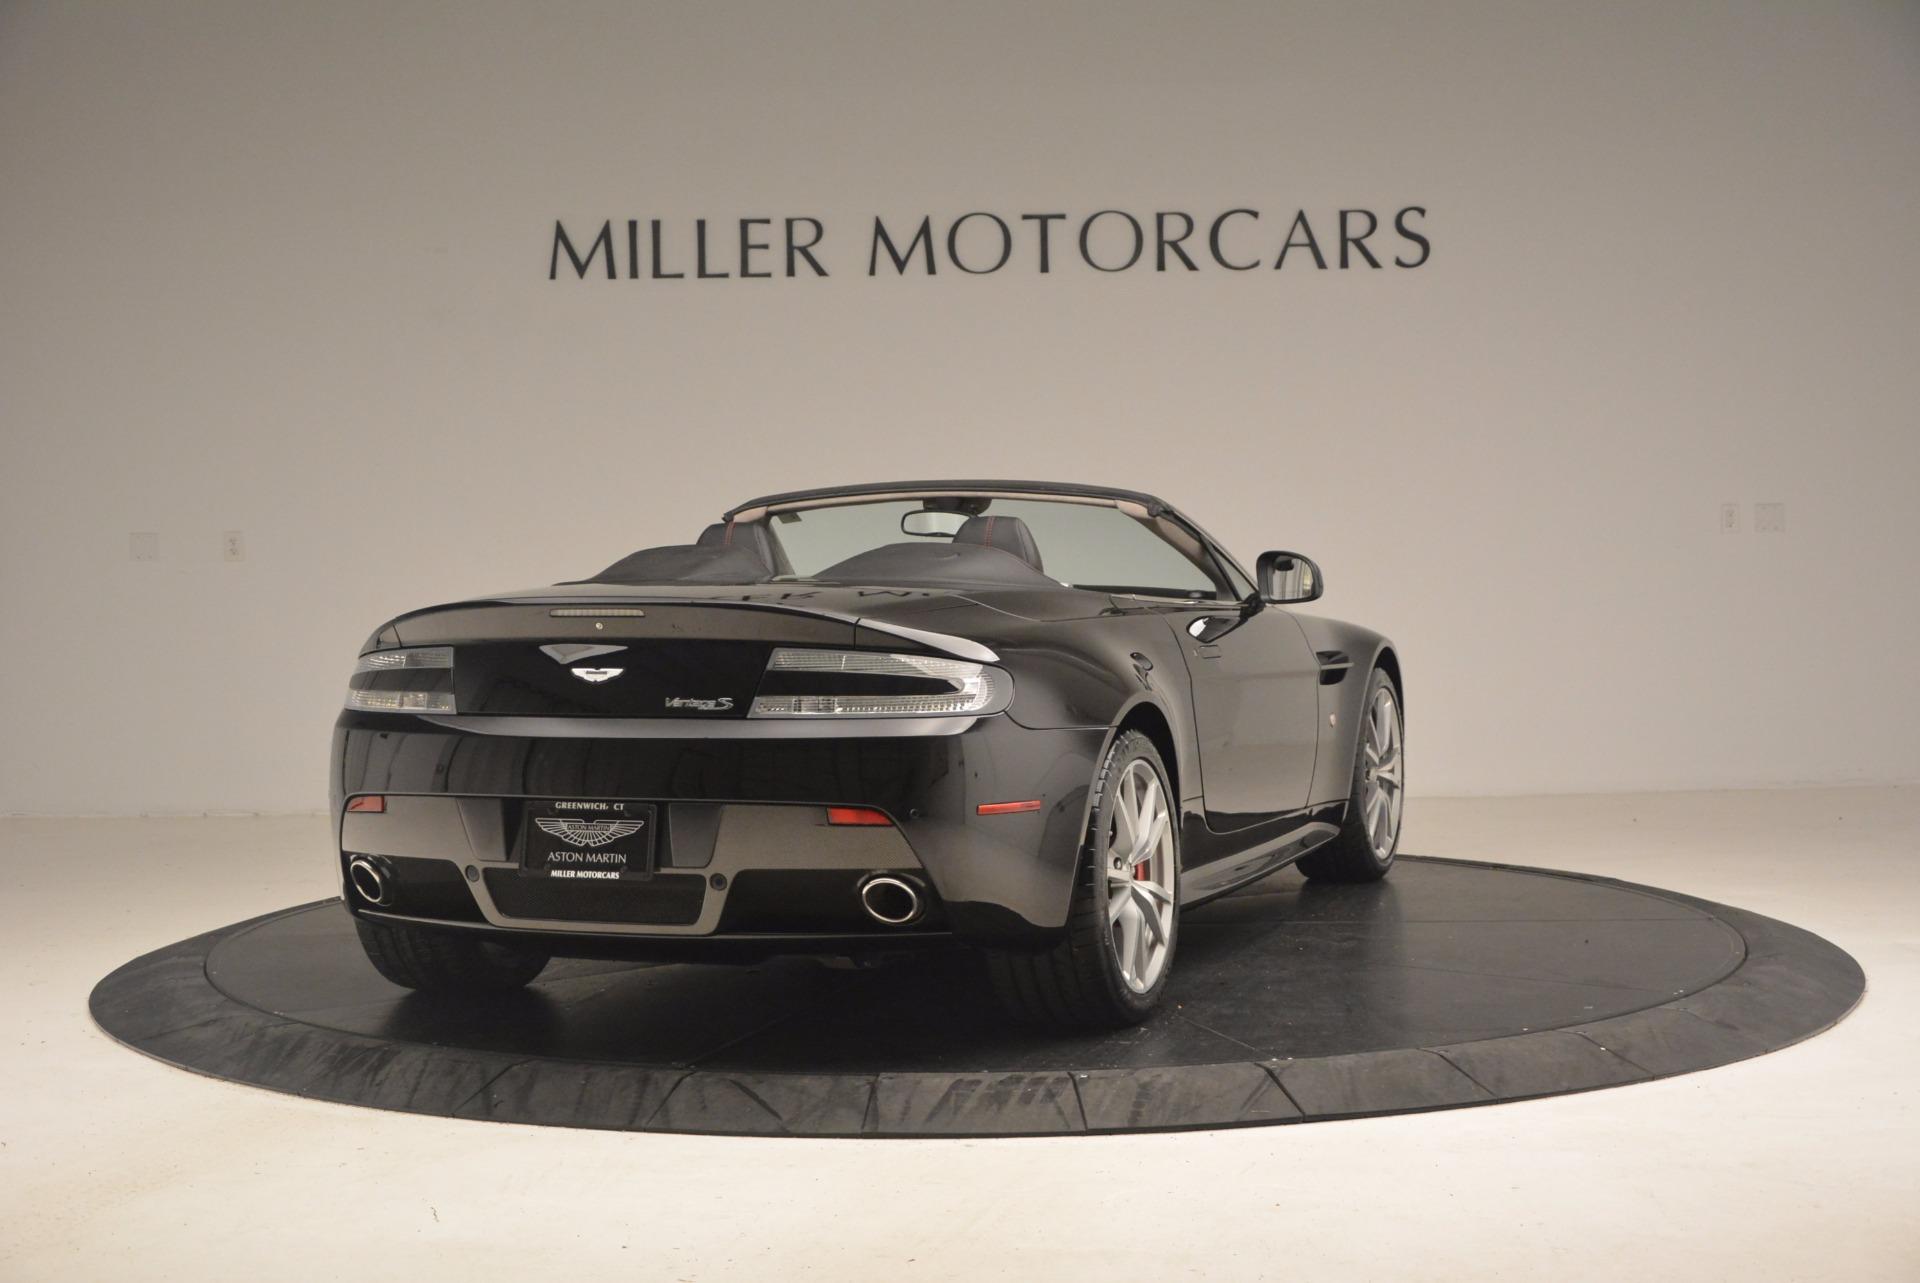 Used 2012 Aston Martin V8 Vantage S Roadster For Sale In Westport, CT 1181_p7